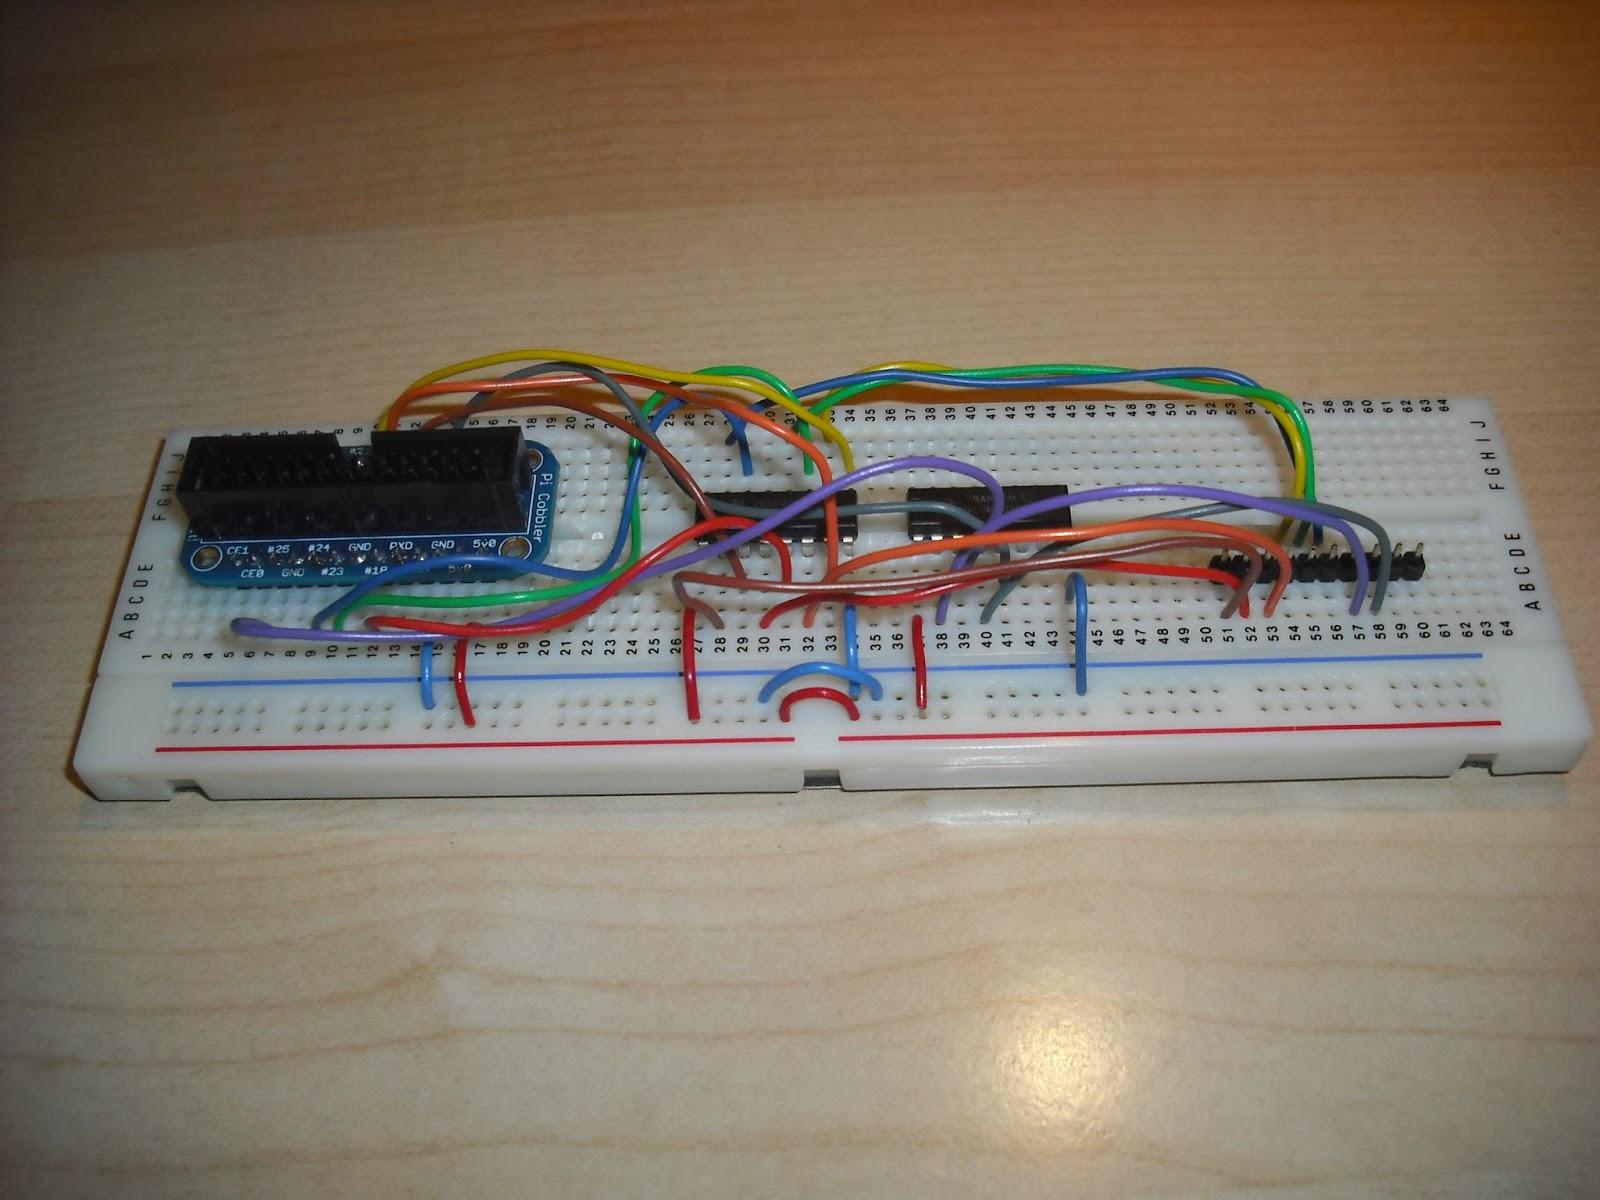 Rpi Gpio Interface Circuits Elinuxorg